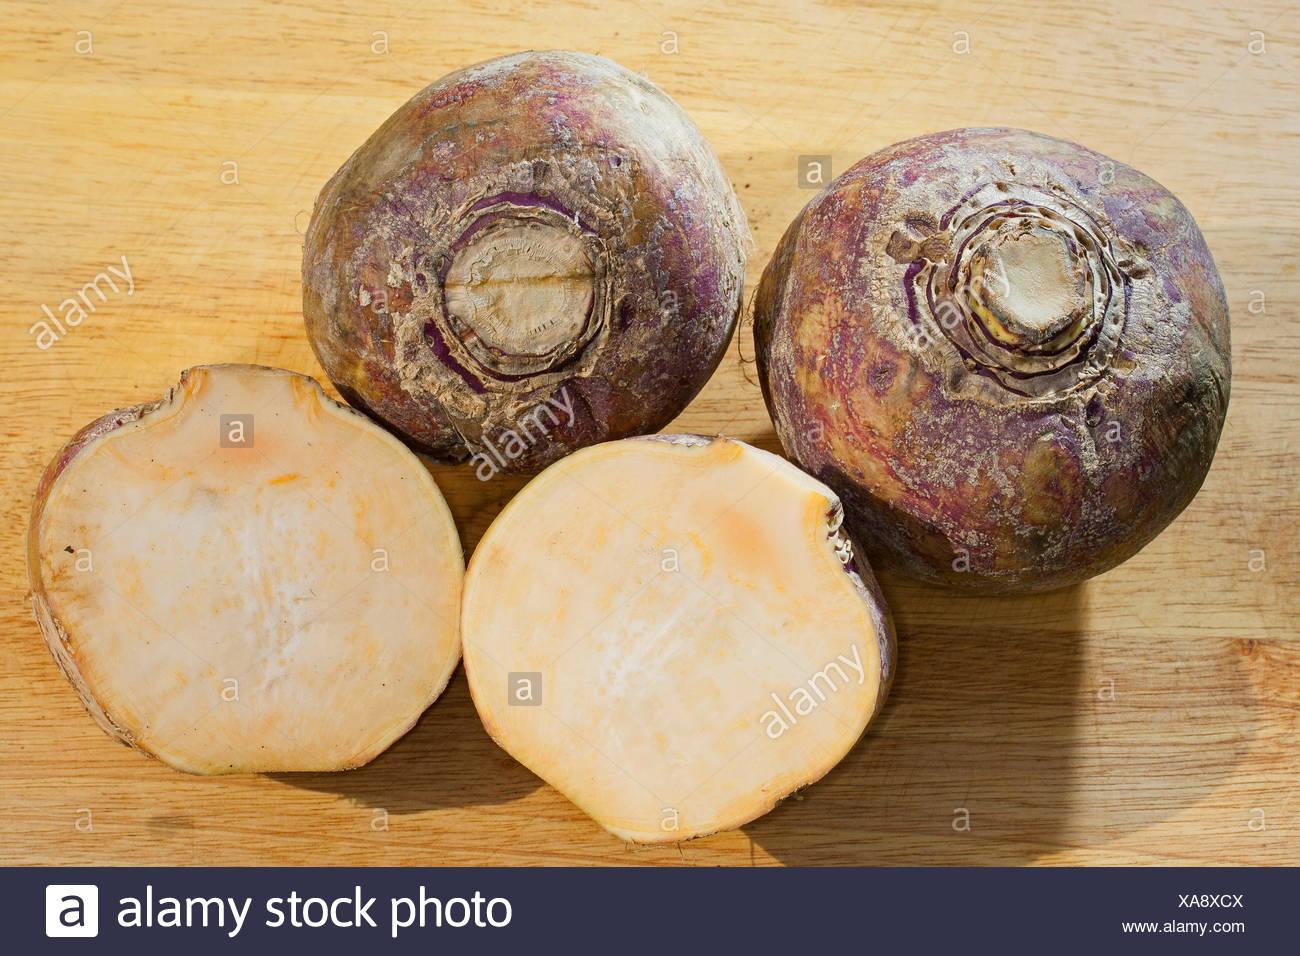 rutabaga, swede, turnip, yellow turnip, neep, root, beet (Brassica napus subsp. rapifera, Brassica napus rapifera, Brassica rapifera), three harvested rutabagas, one of them halved, Germany - Stock Image